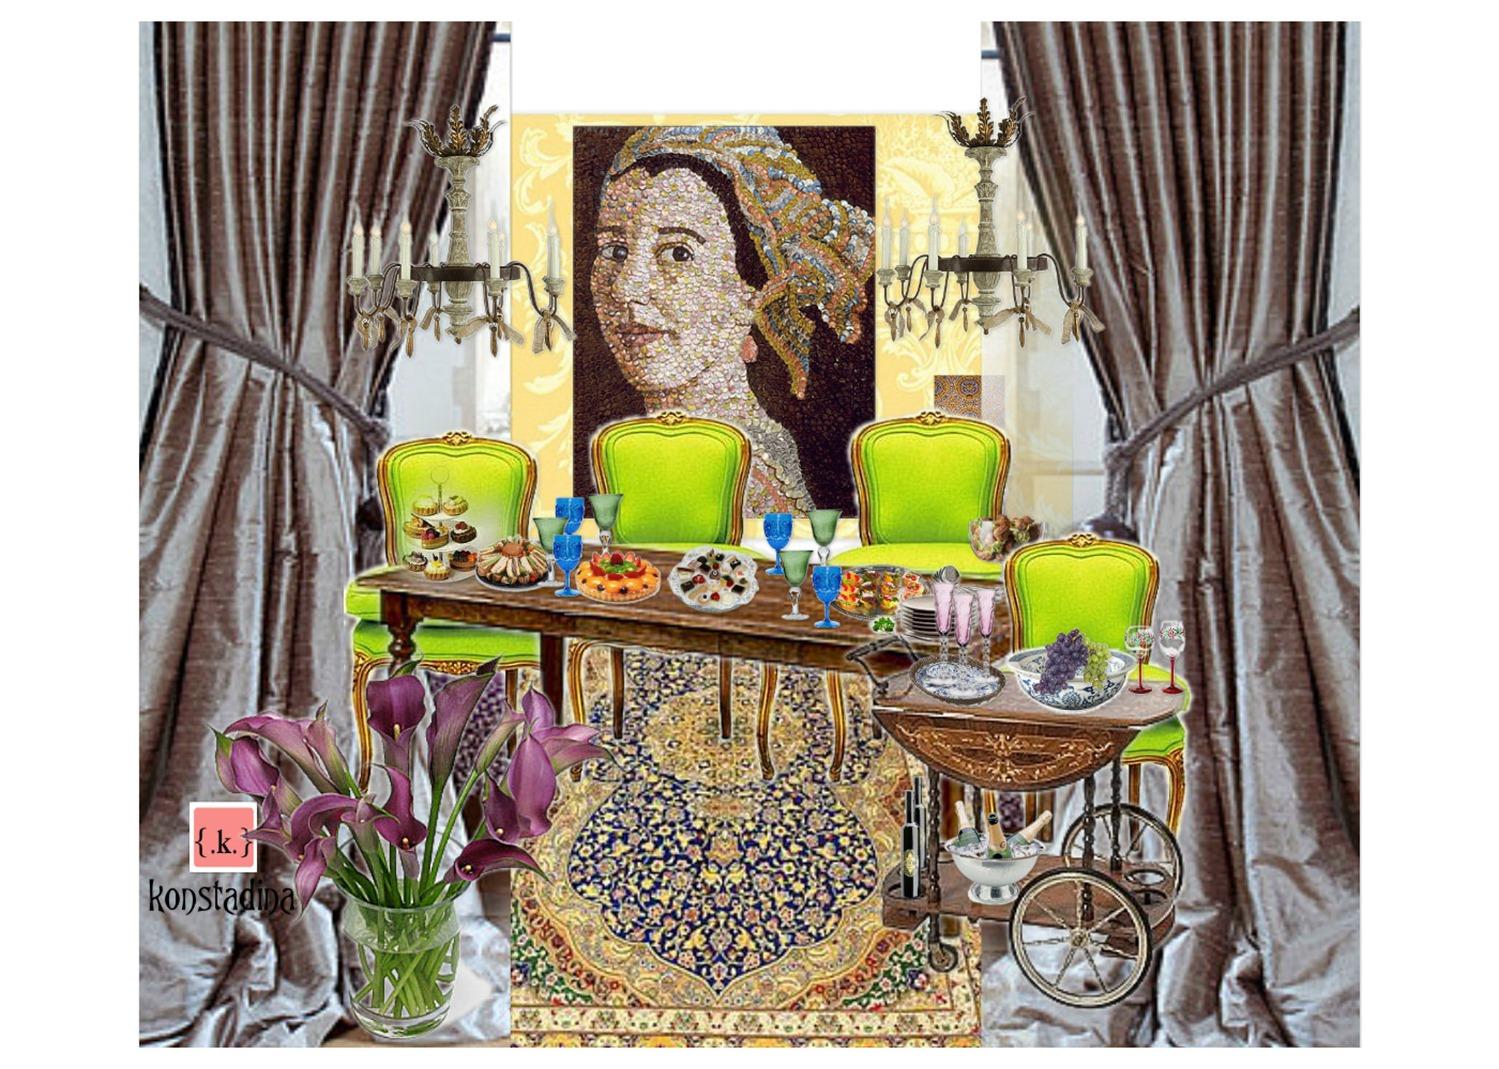 design board: Classic style dining room -konstadina nastou- {.k.} blog, Κωνσταντίνα Νάστου